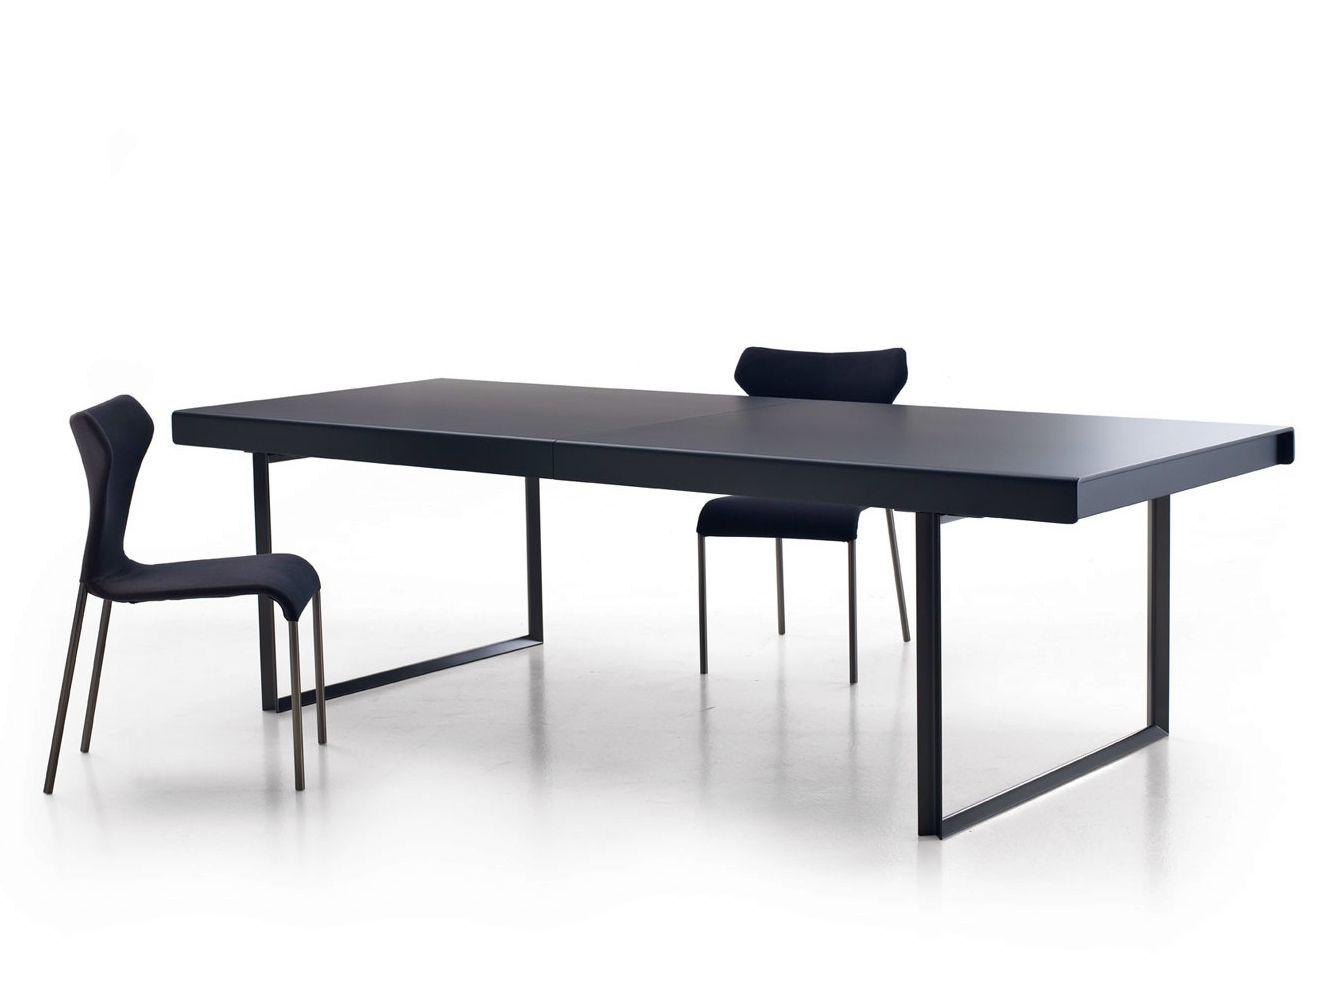 extending rectangular table athos 2012 by b b italia. Black Bedroom Furniture Sets. Home Design Ideas